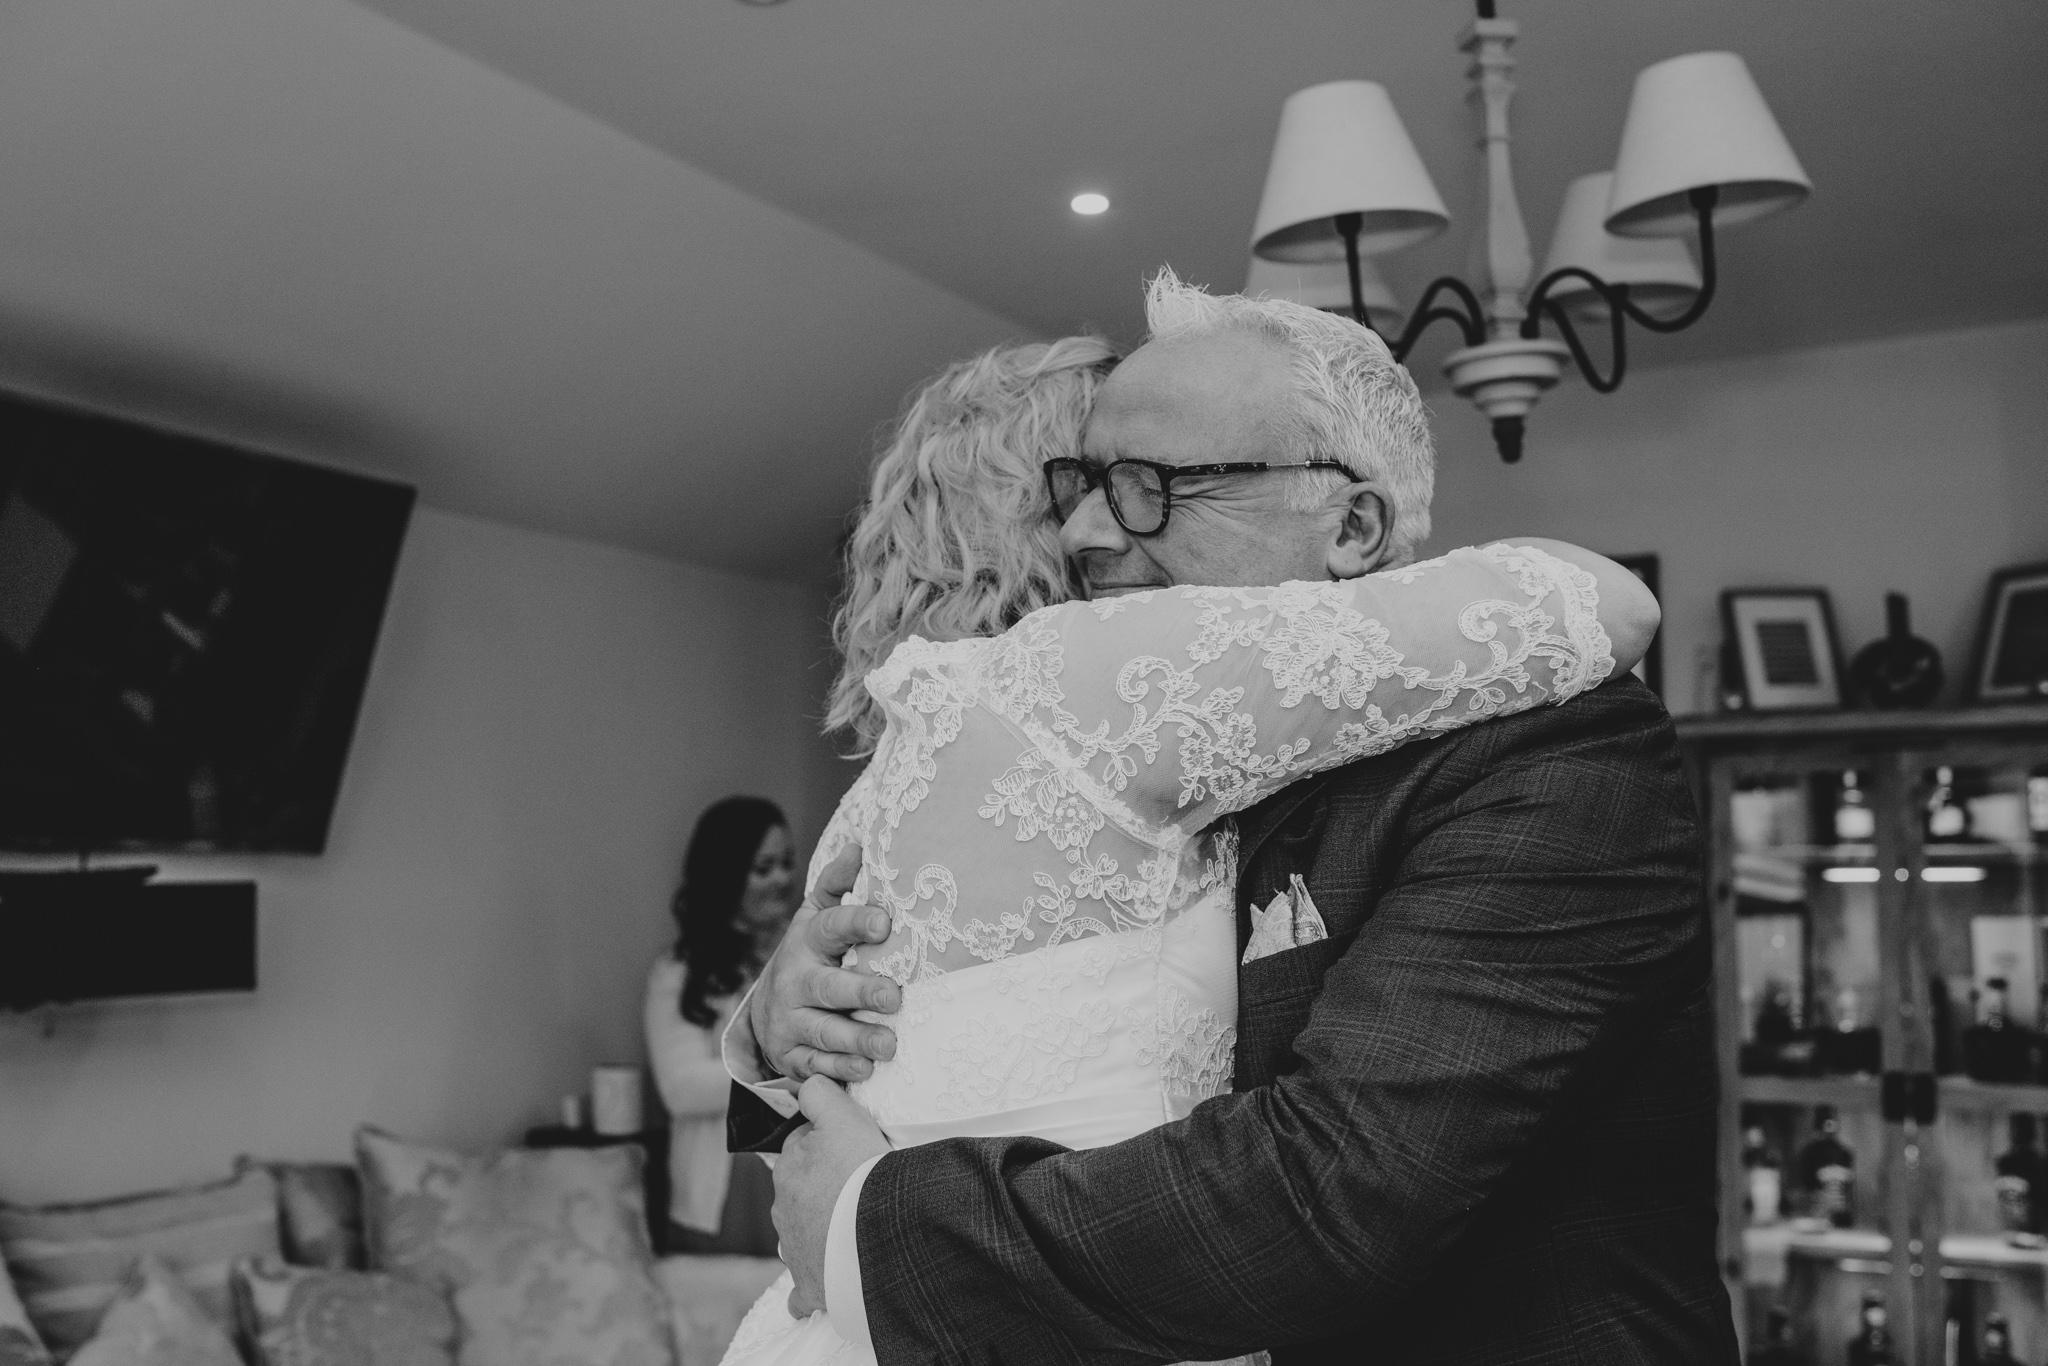 rhia-james-rustic-crabbs-barn-vintage-50s-retro-wedding-grace-elizabeth-colchester-essex-alternative-relaxed-wedding-family-photography-devon-suffolk-norfolk-essex (47 of 138).jpg